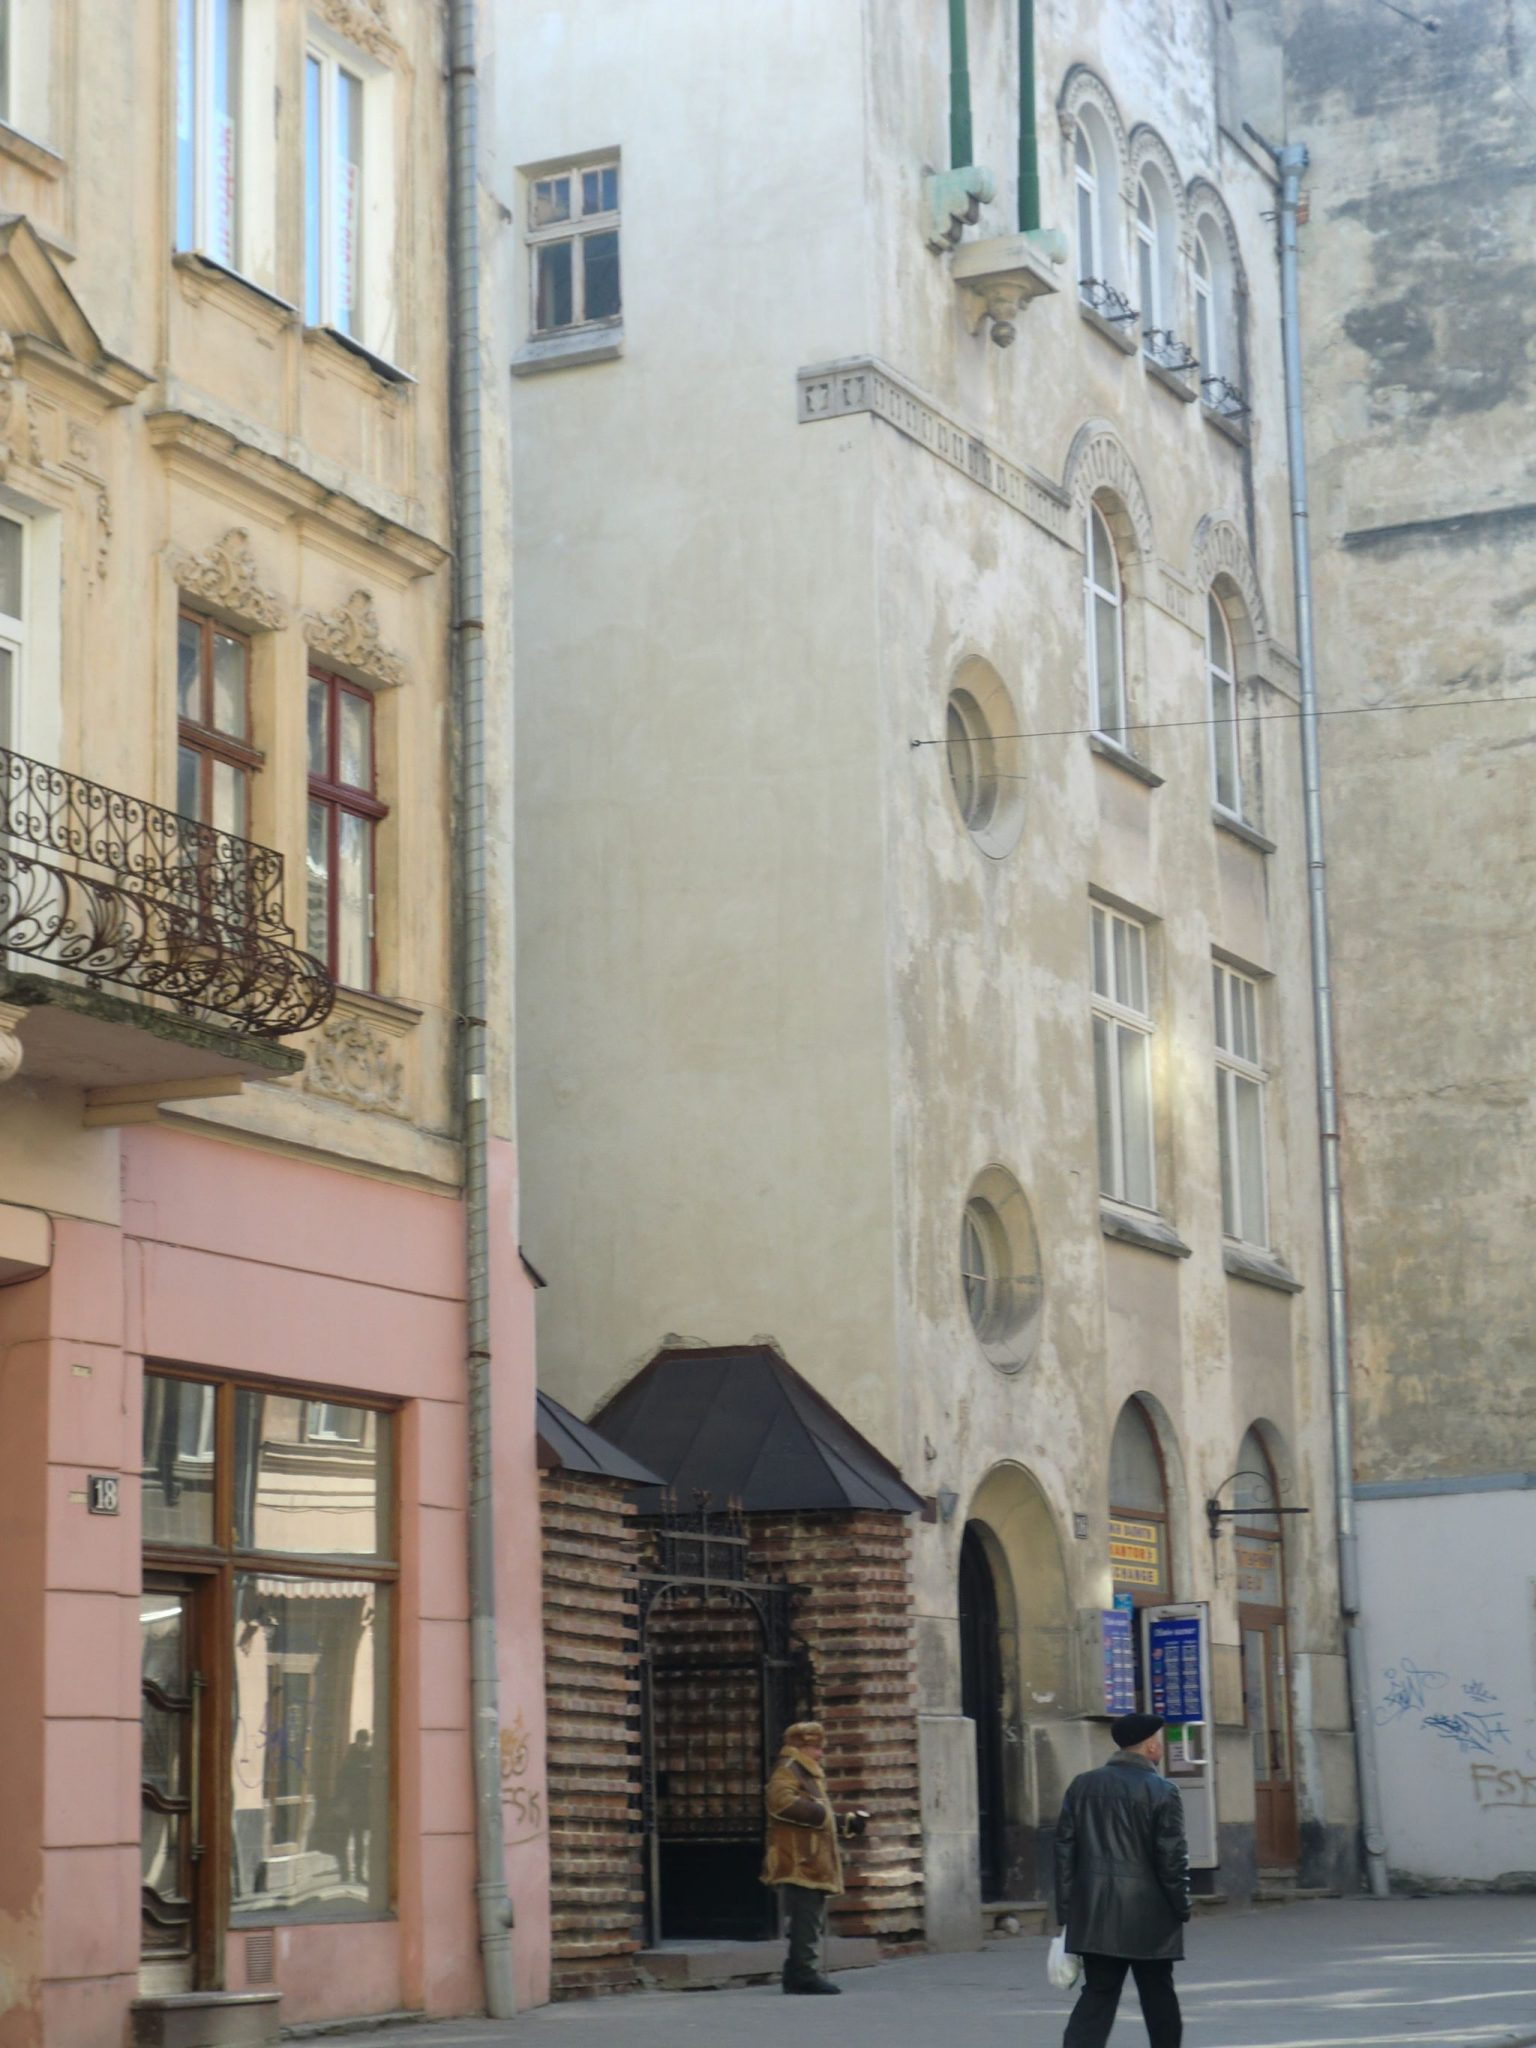 Lviv Armenian street - Lviv, the Ukrainian pearl